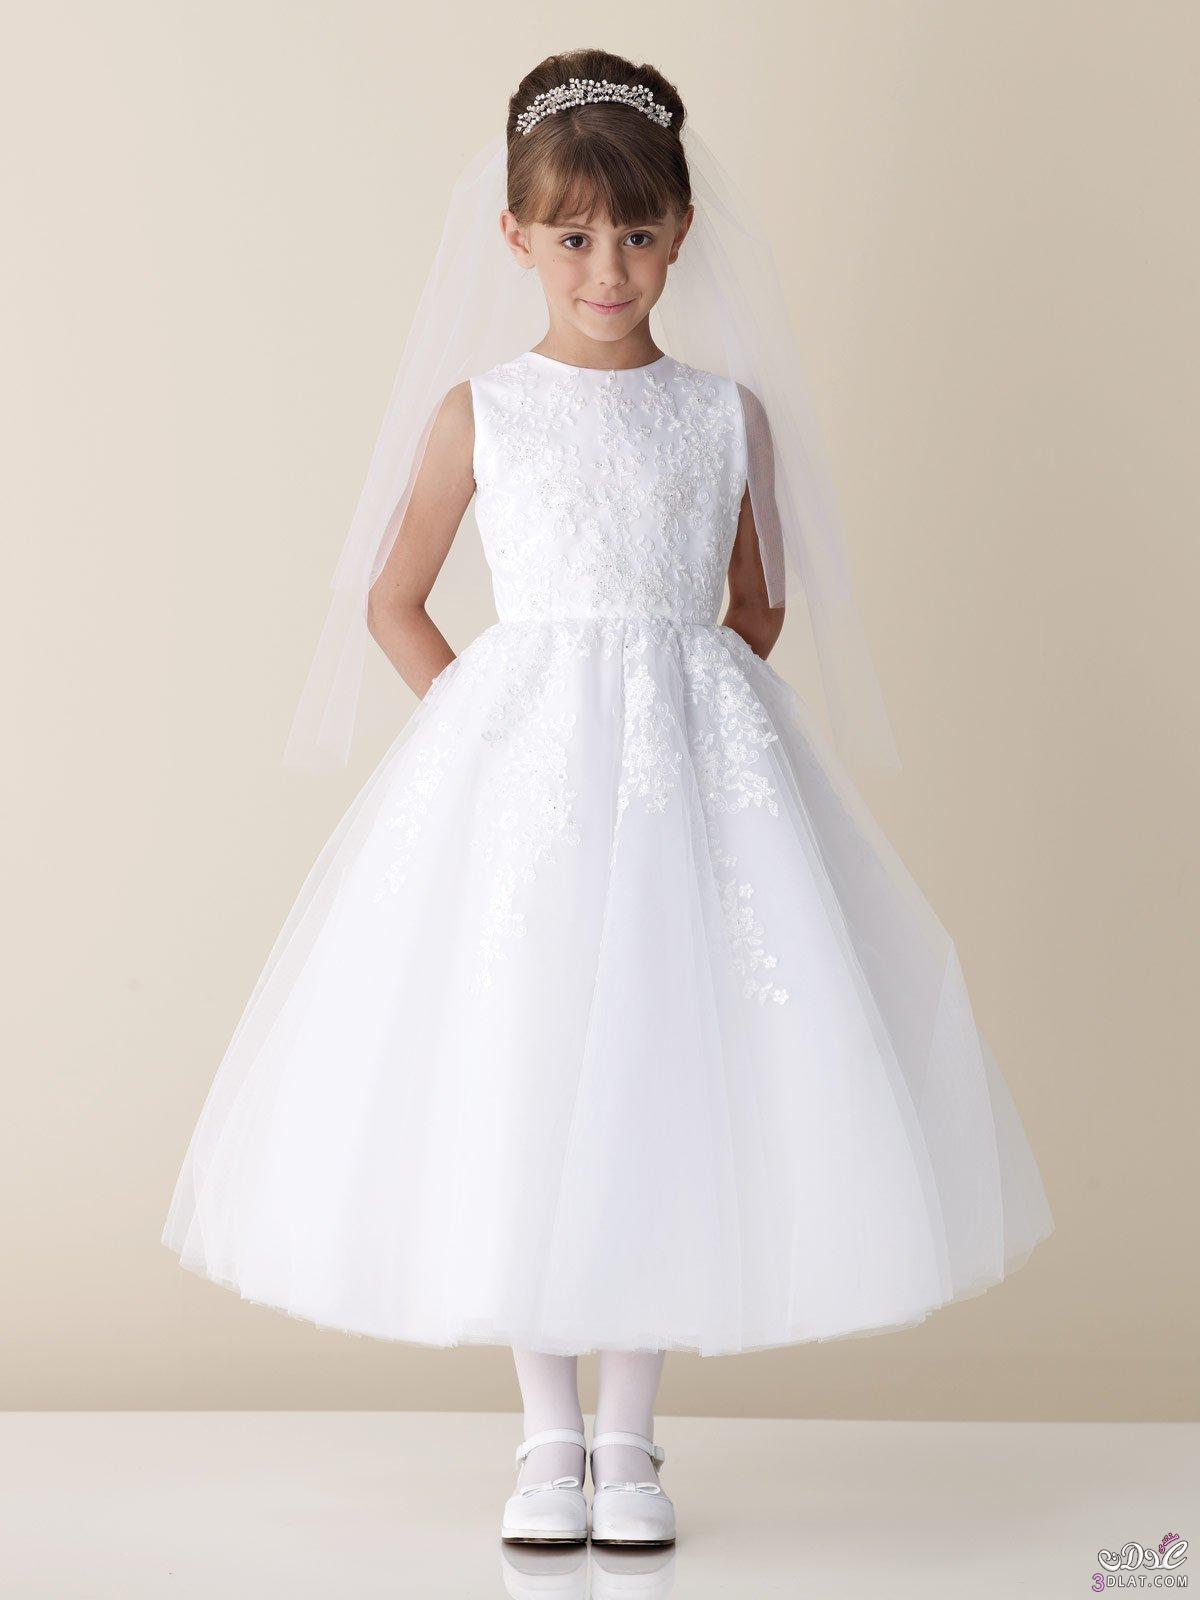 62d97c13b ... فساتين اطفال بنات صغار ، كولكشن صور فساتين وملابس , فساتين اطفال  للاعراس في دبي ، اجمل فساتين للاطفال , صور فساتين اطفال جميلة ,احدث تشكيلة  للاطفال 2018 ...